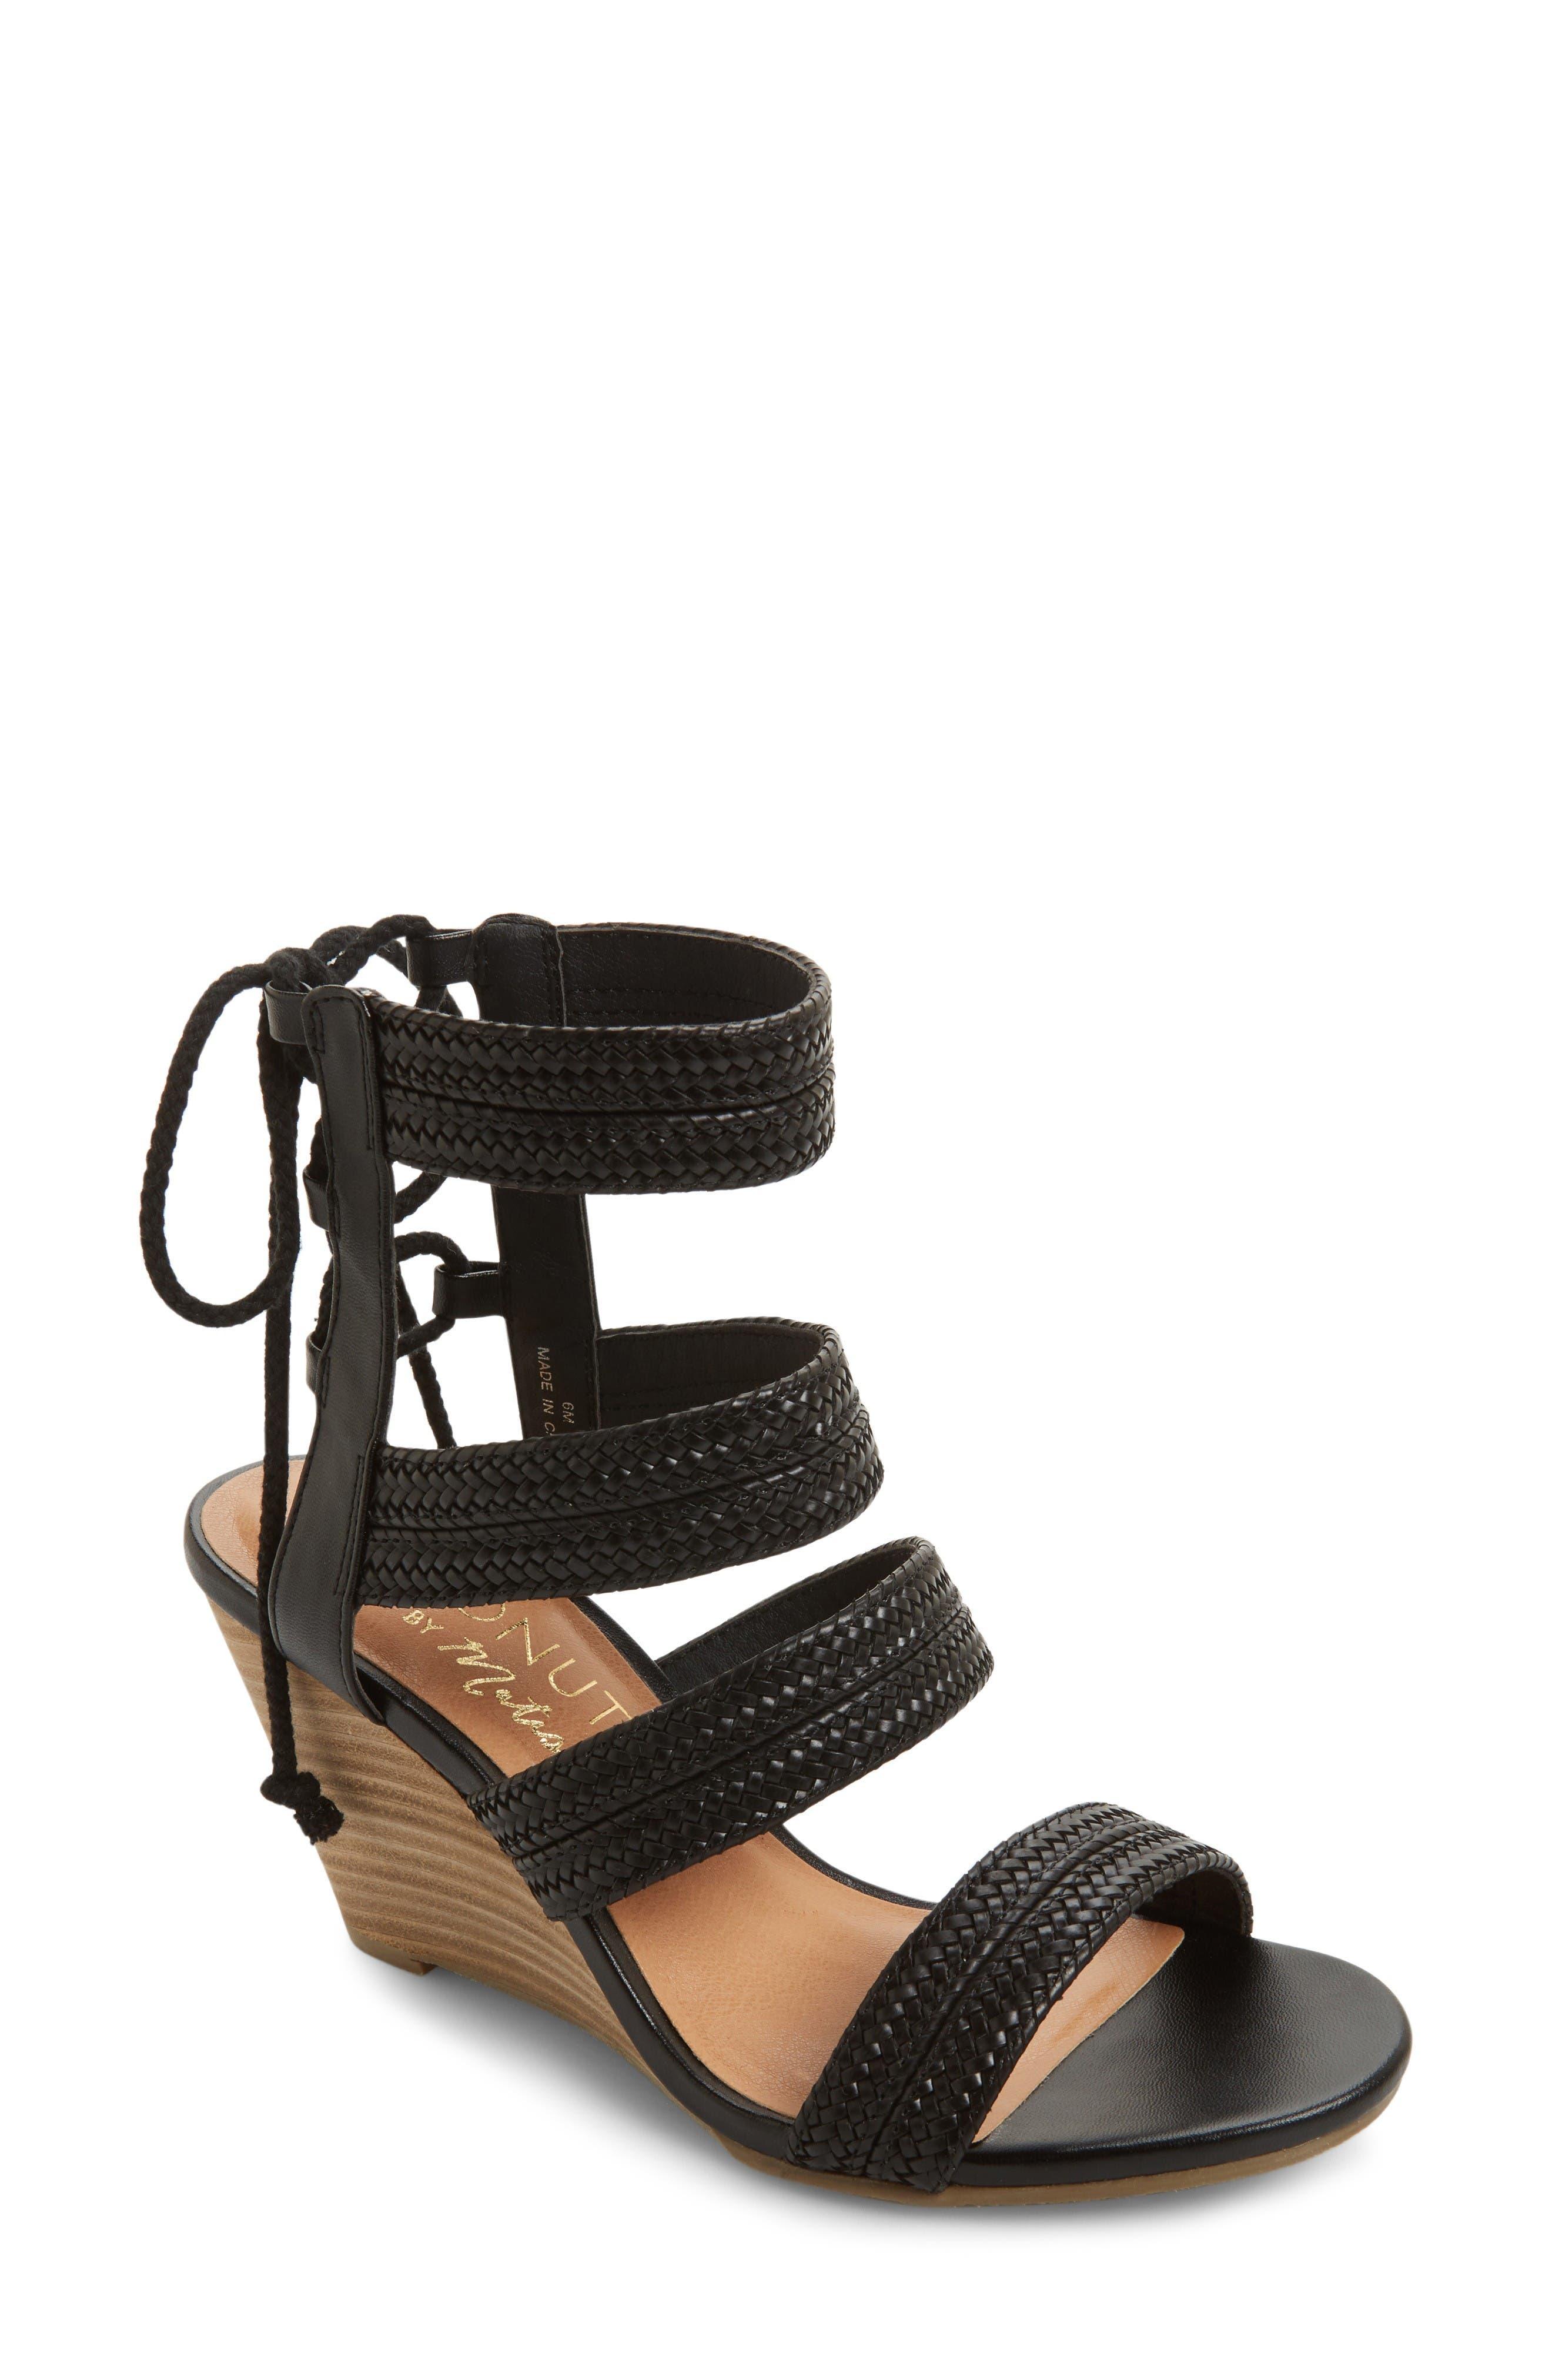 Main Image - Matisse Whimsy Wedge Sandal (Women)